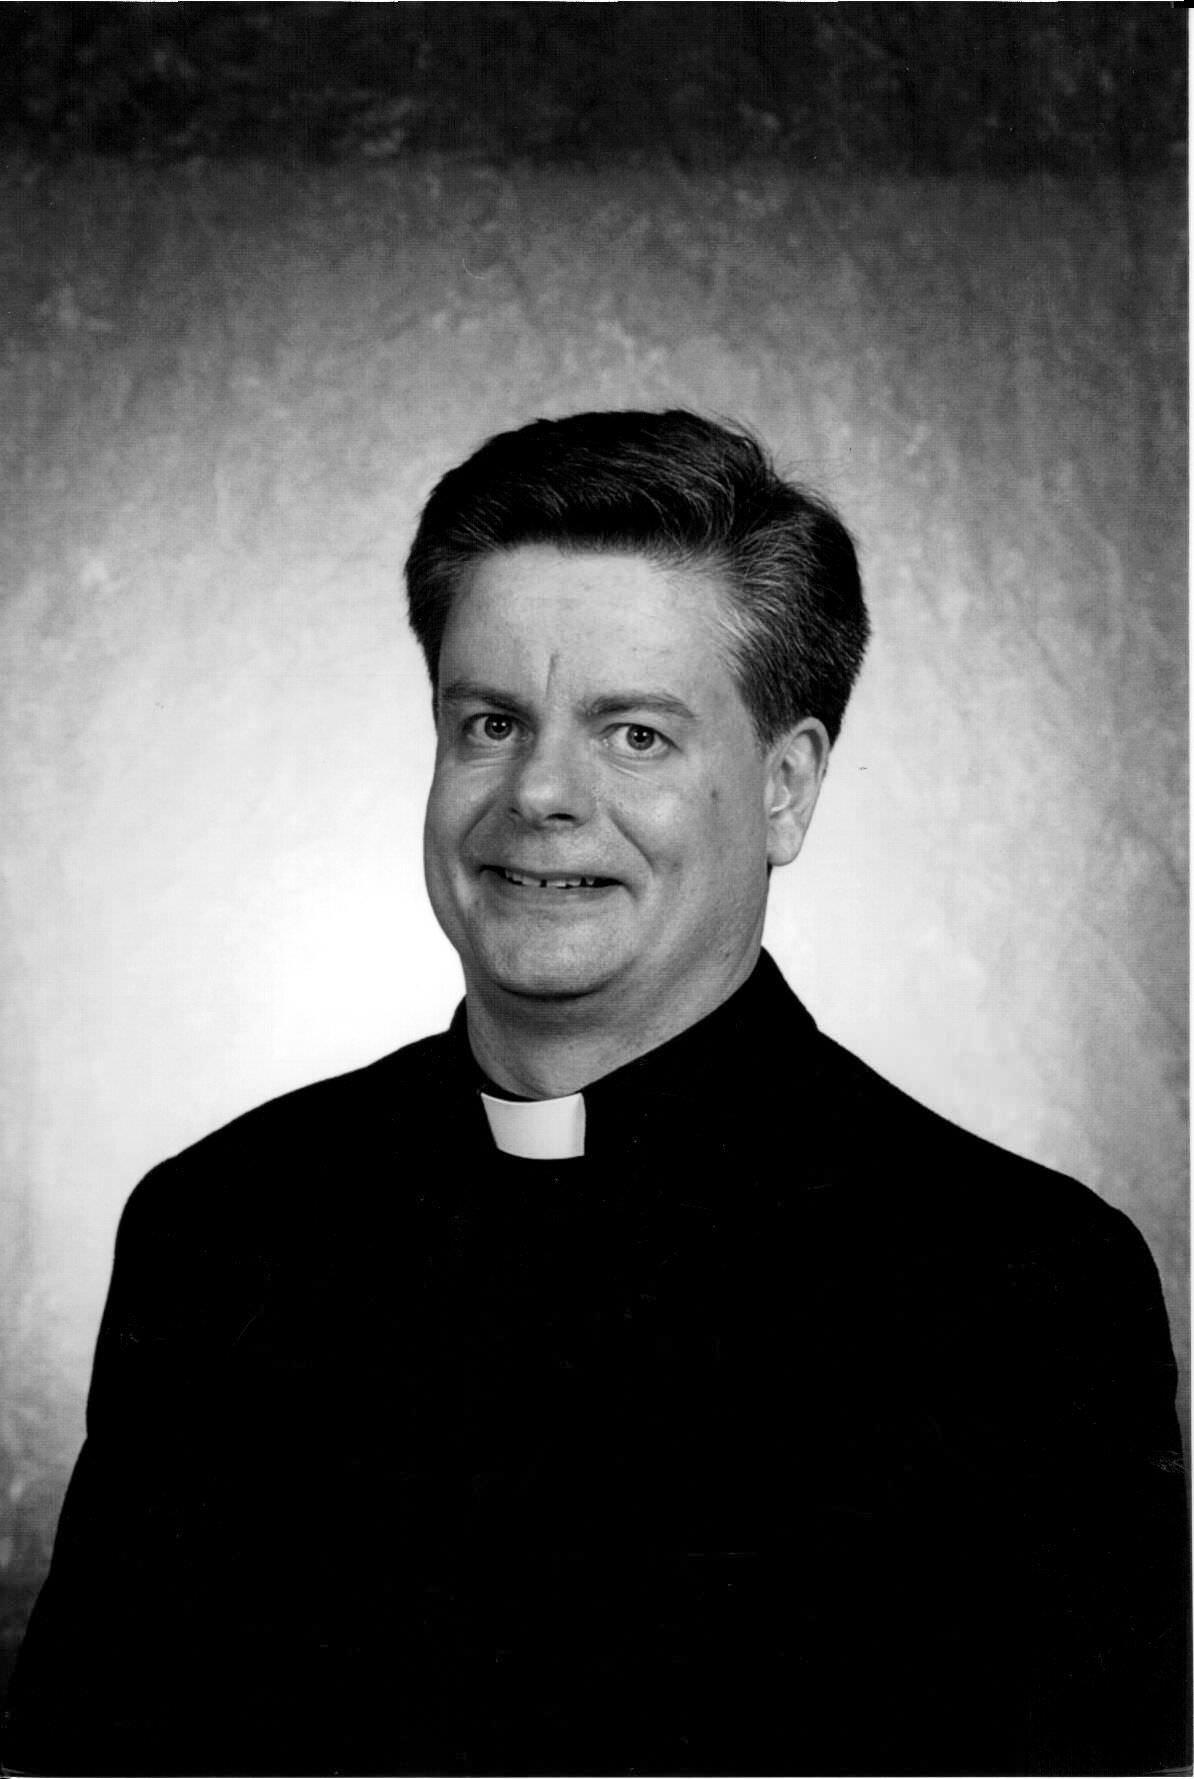 + Reverend Robert Markovitch Obituary